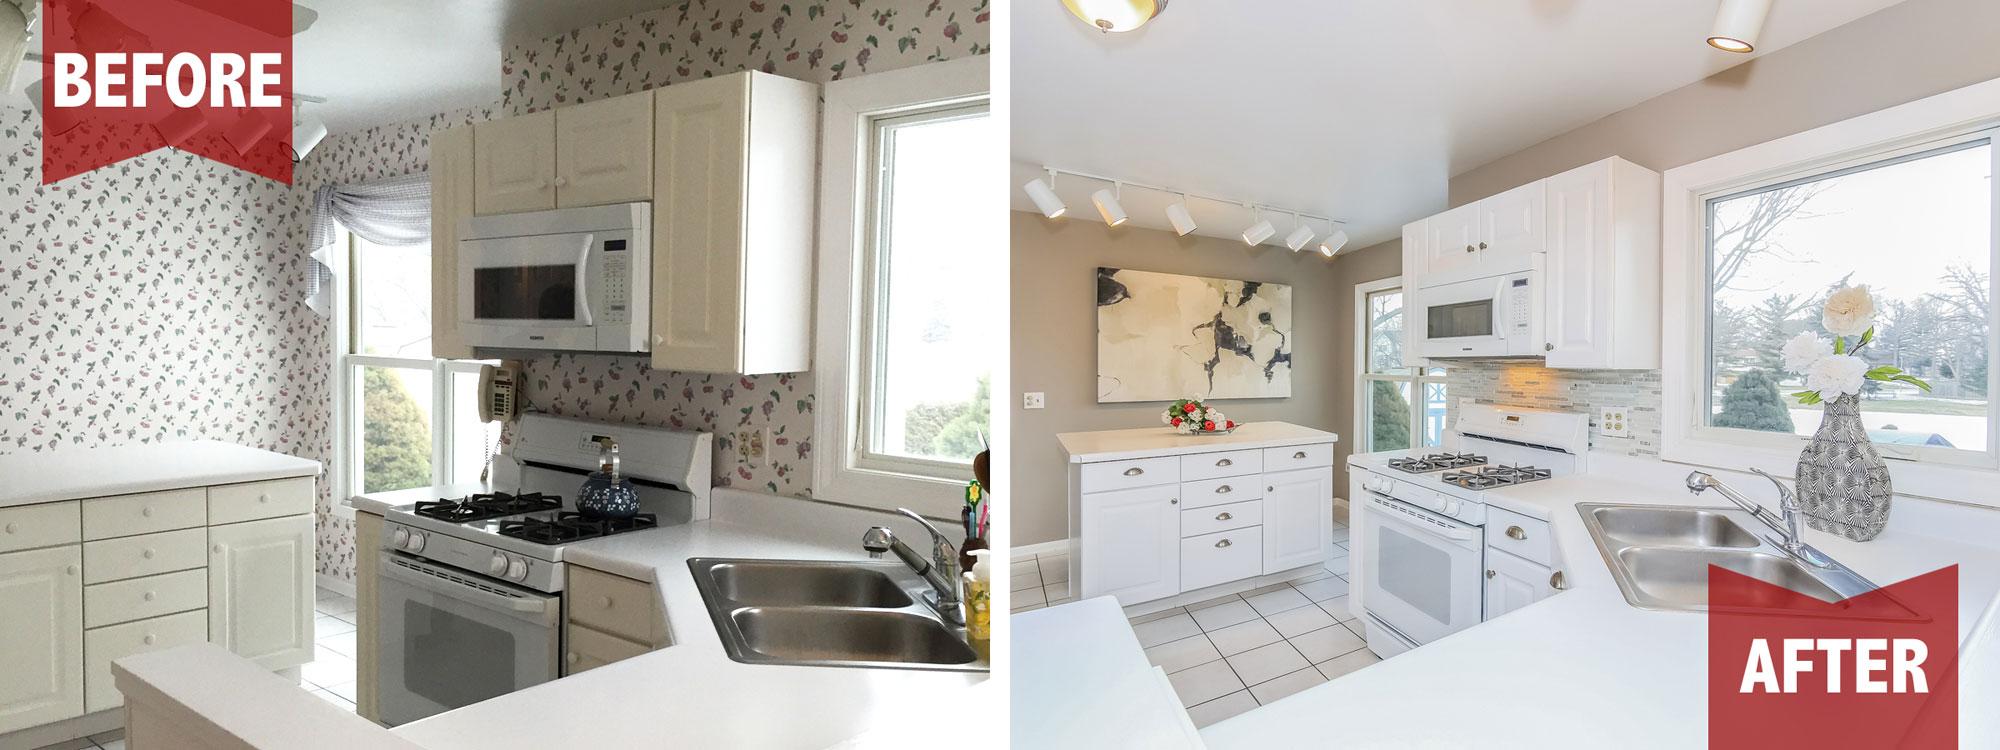 Home Transformations - Lisa Wolf Team